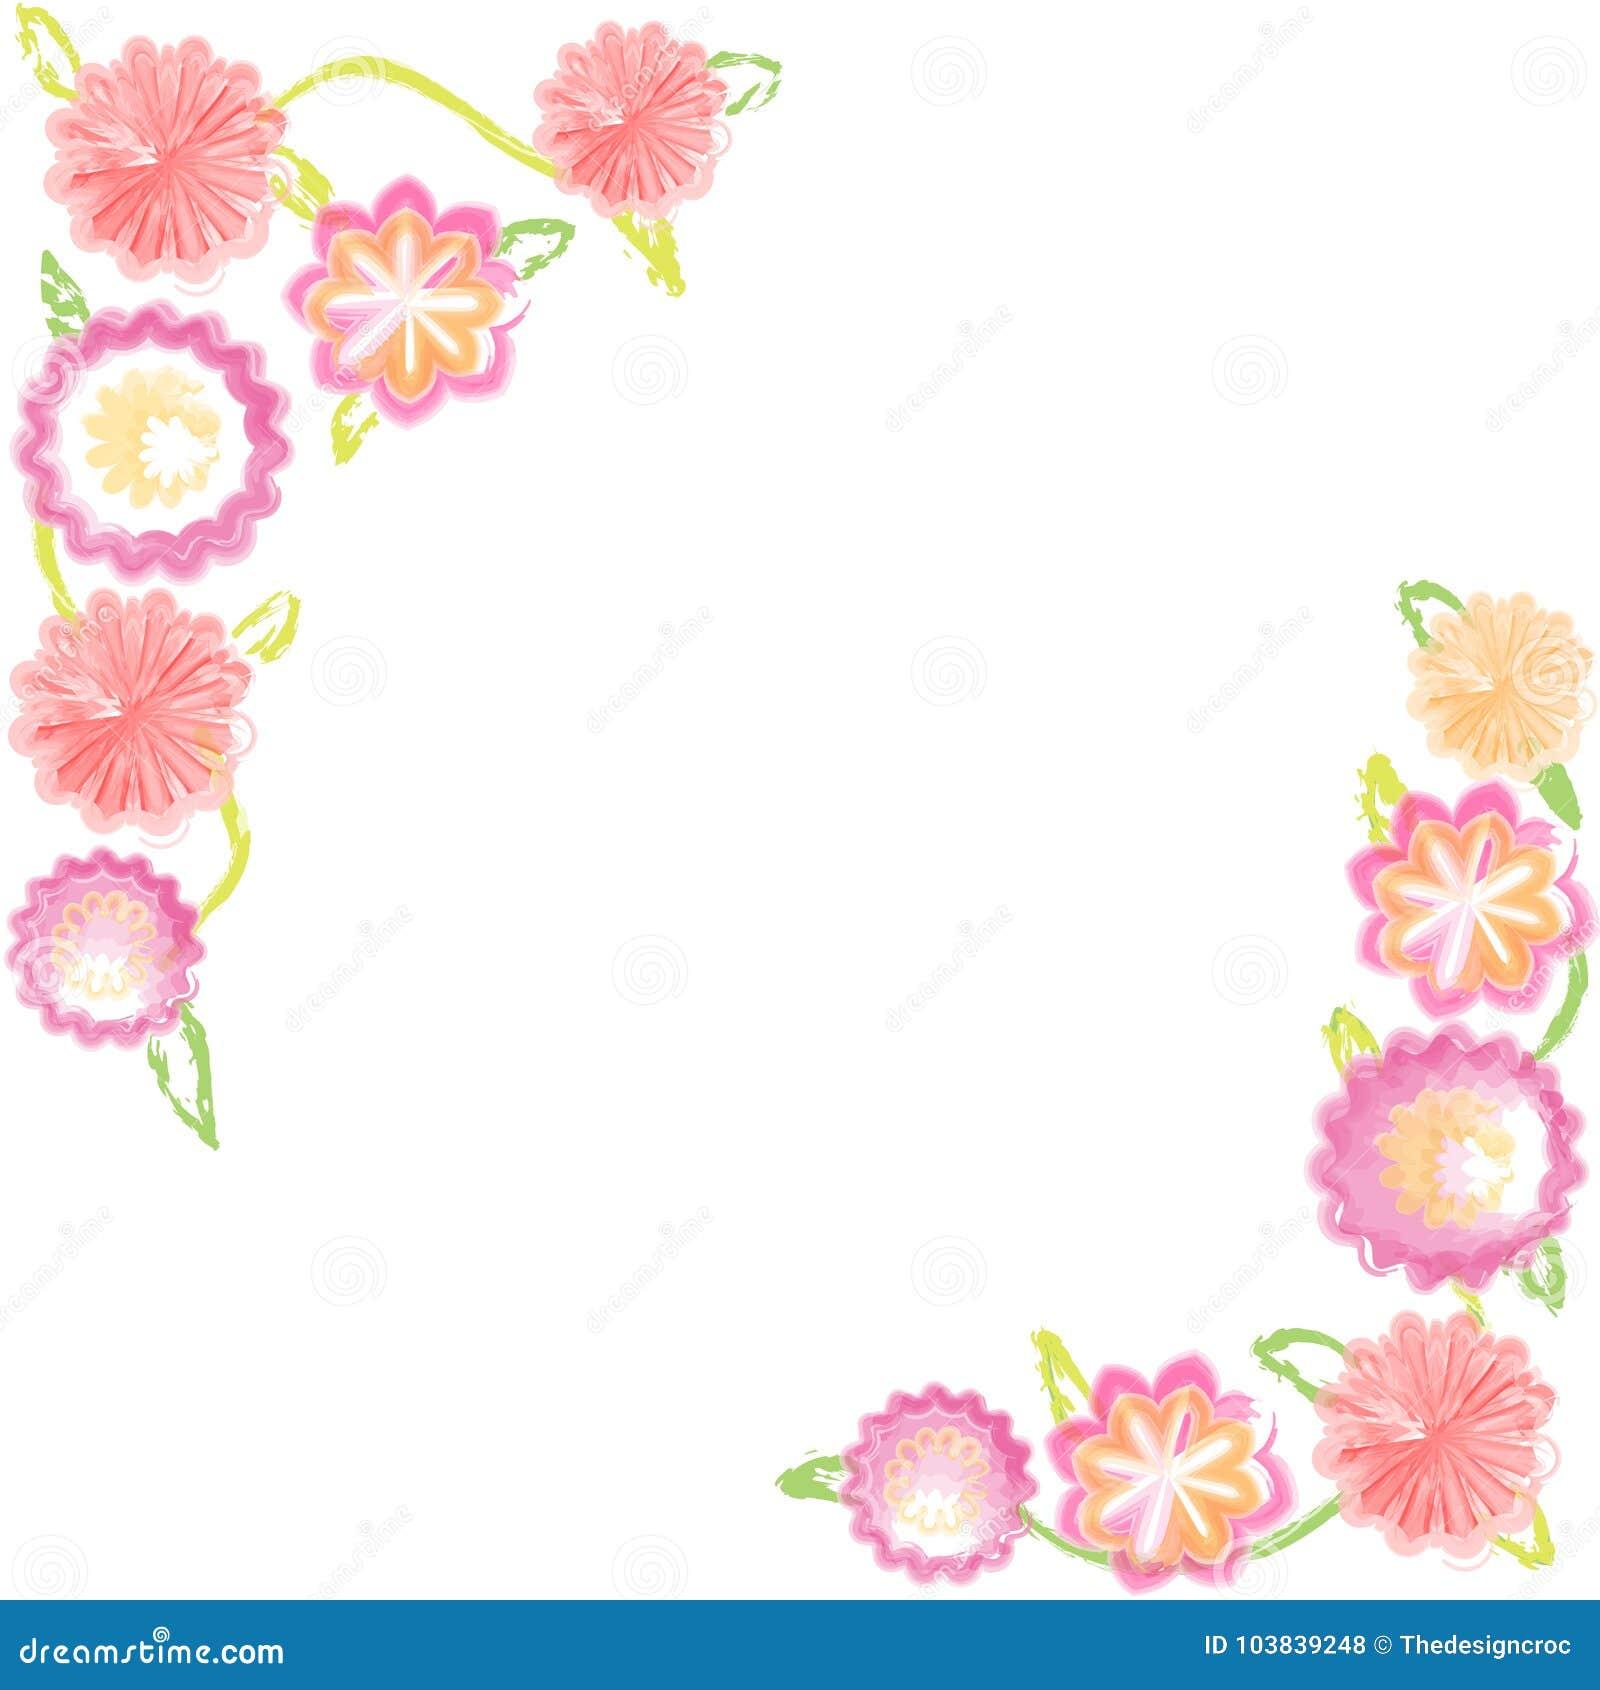 Watercolor Flowers Pink Orange White Background Summer